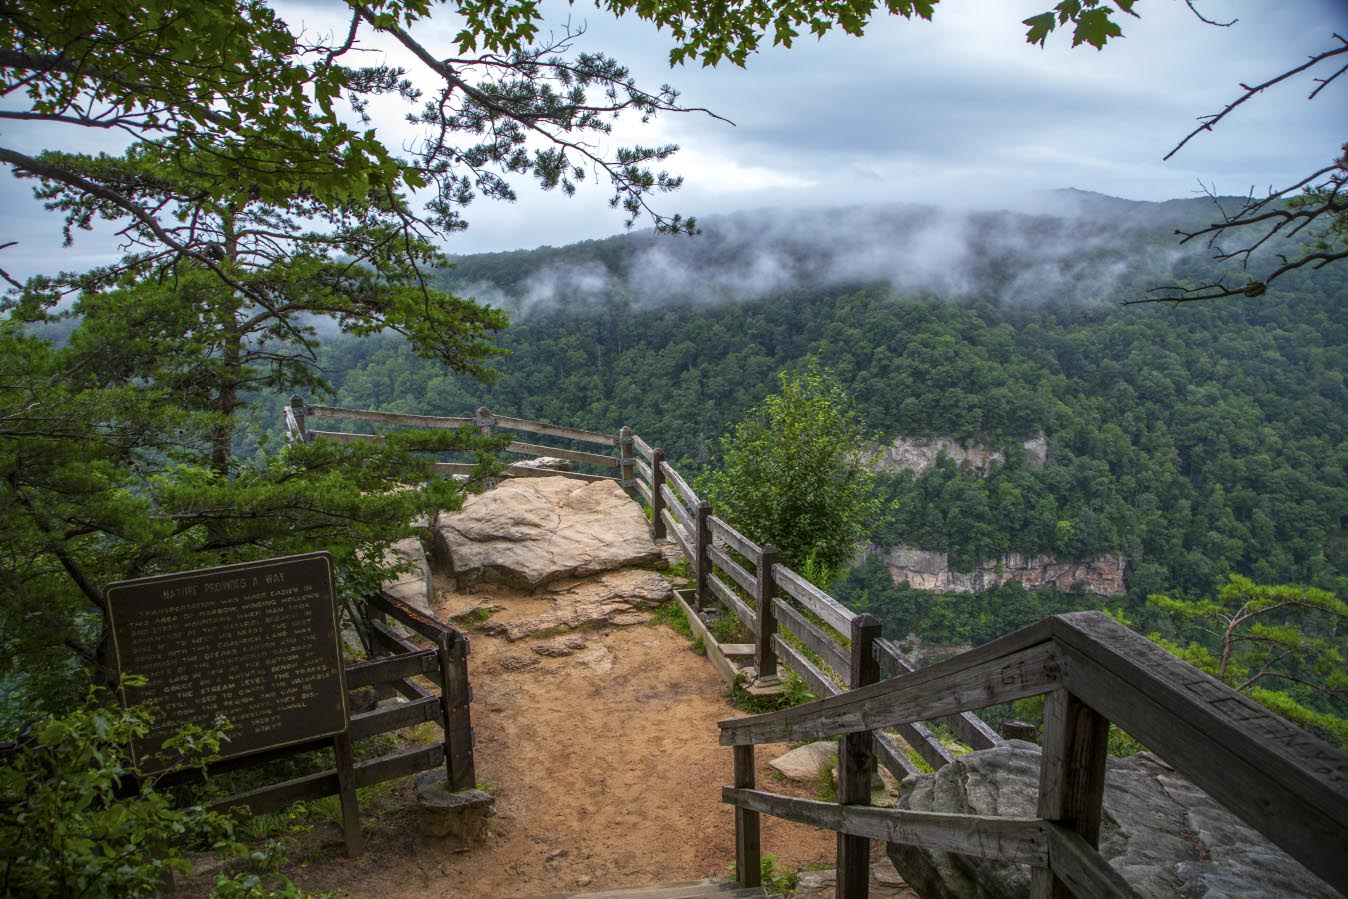 Cabins near charlottesville romance ridge cabins for rent for Charlottesville cabin rentals hot tub